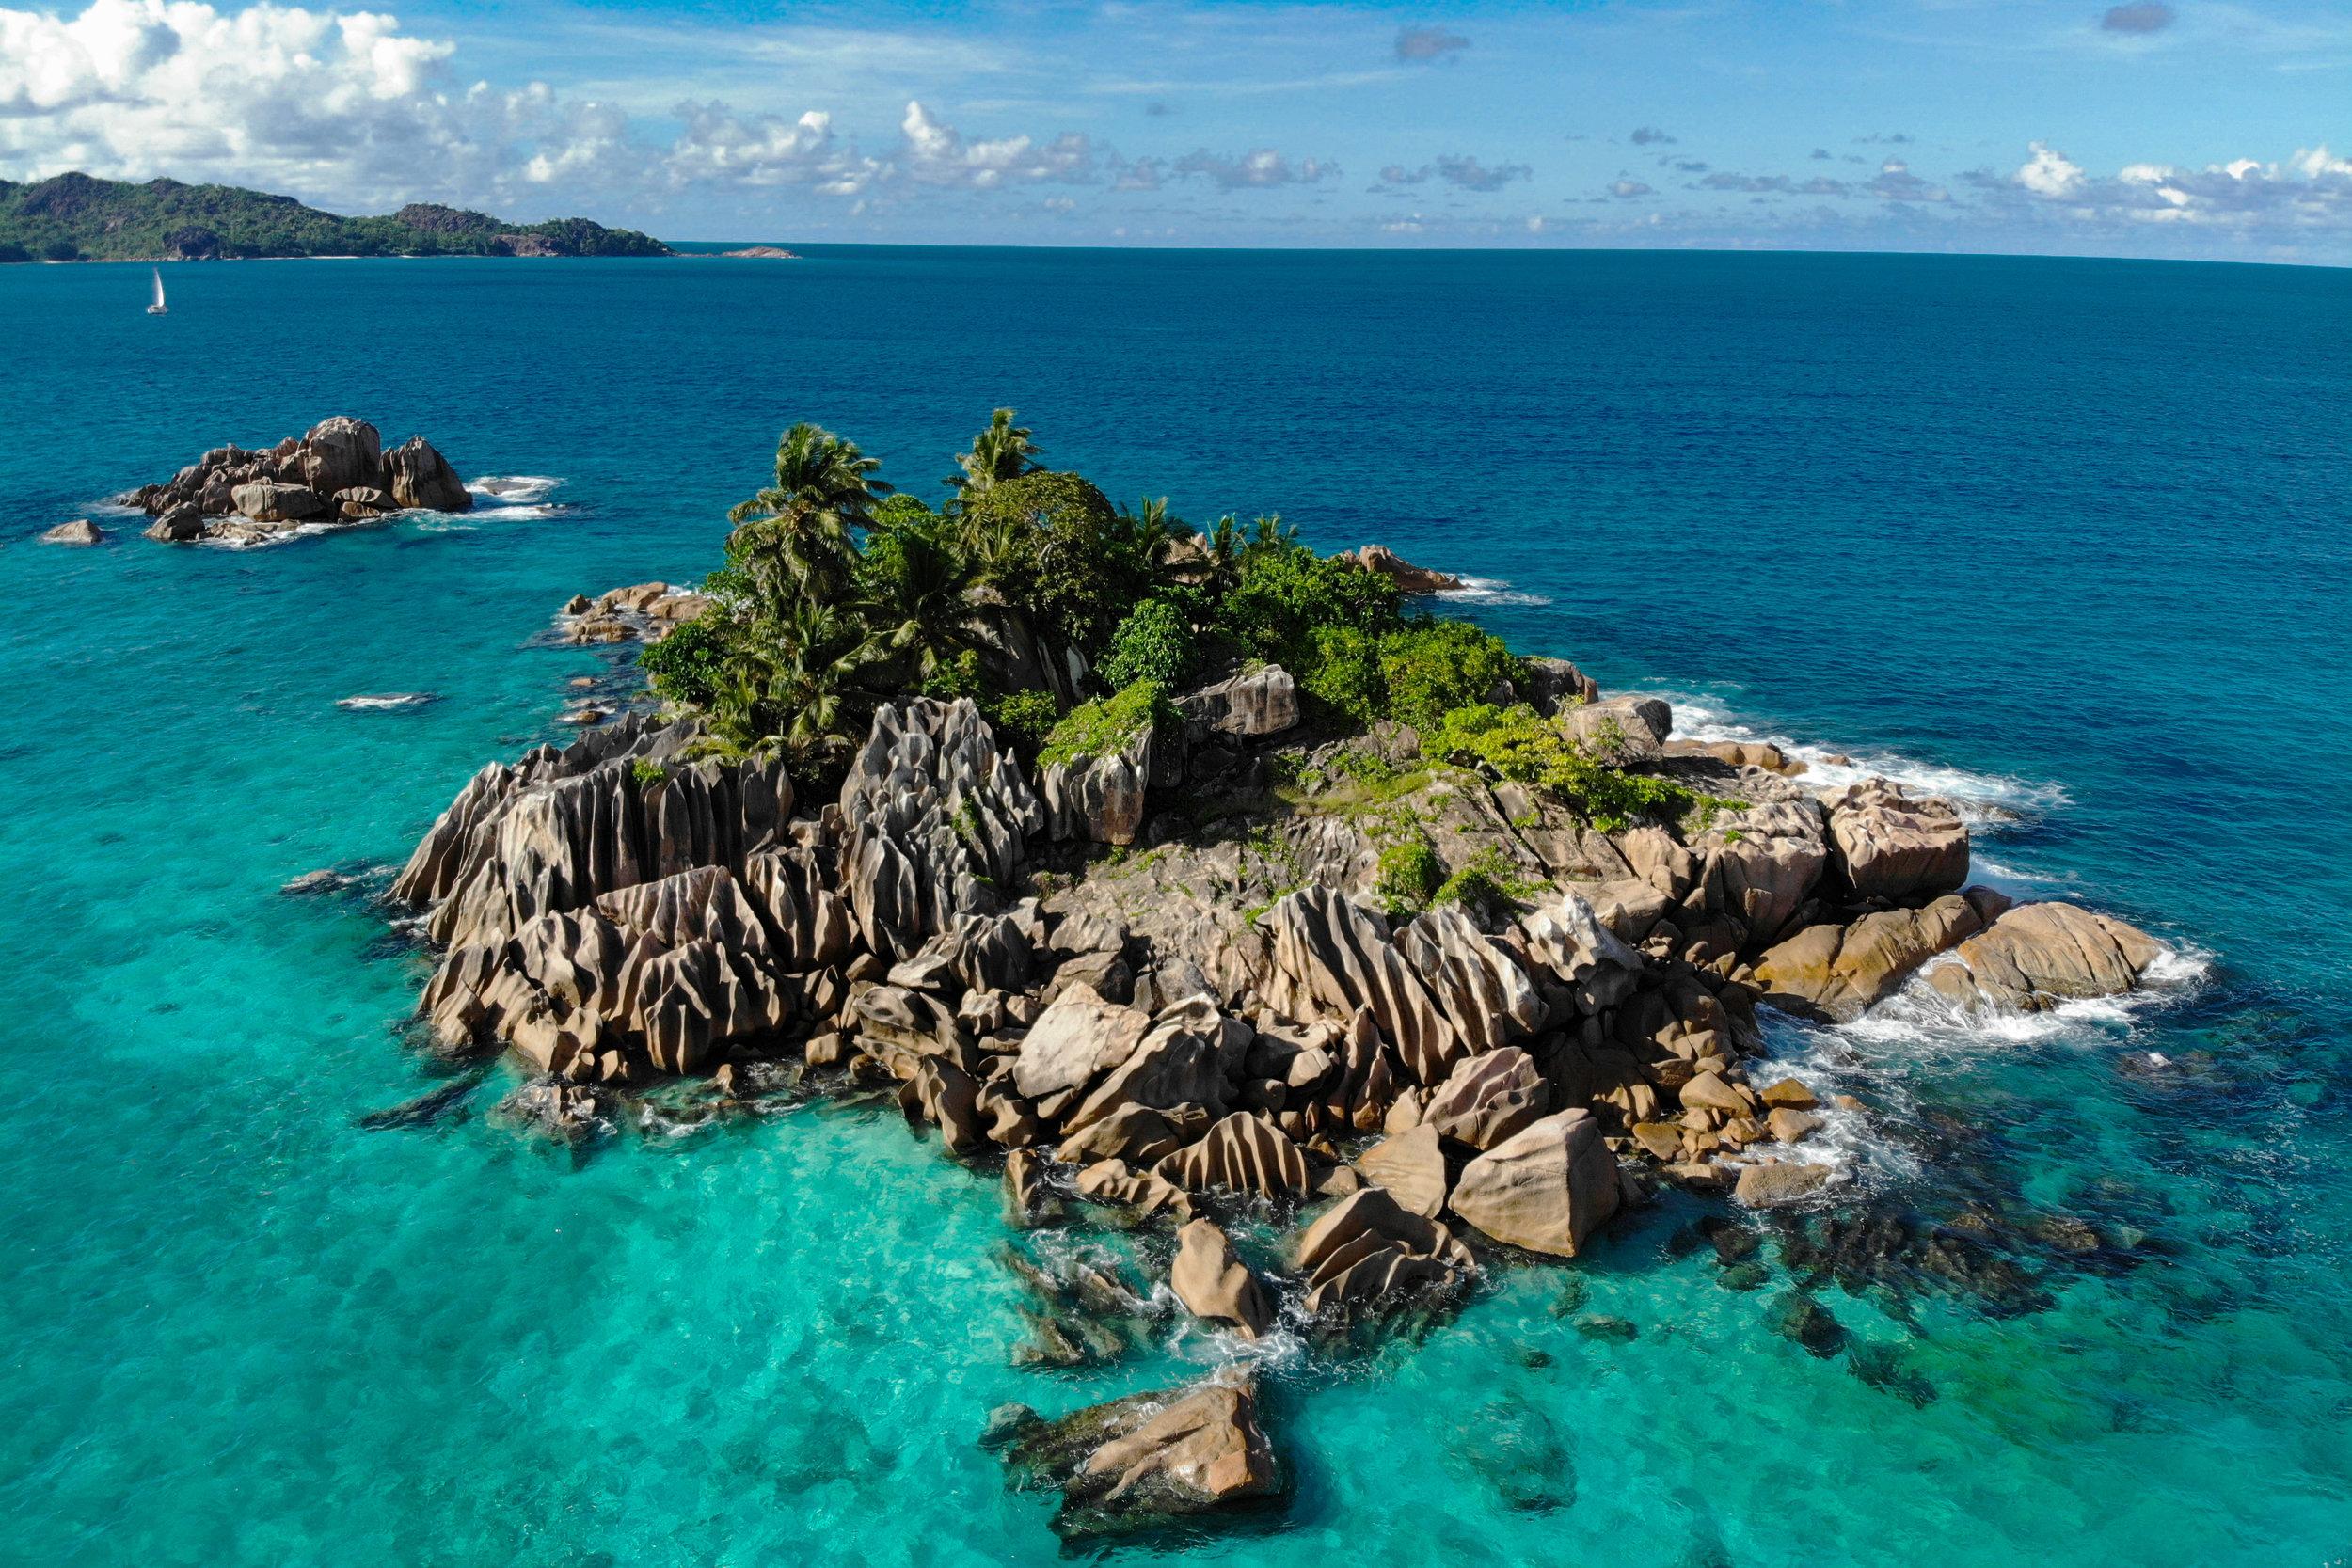 SEYCHELLES credit: THE OCEAN AGENCY / coral reef image bank